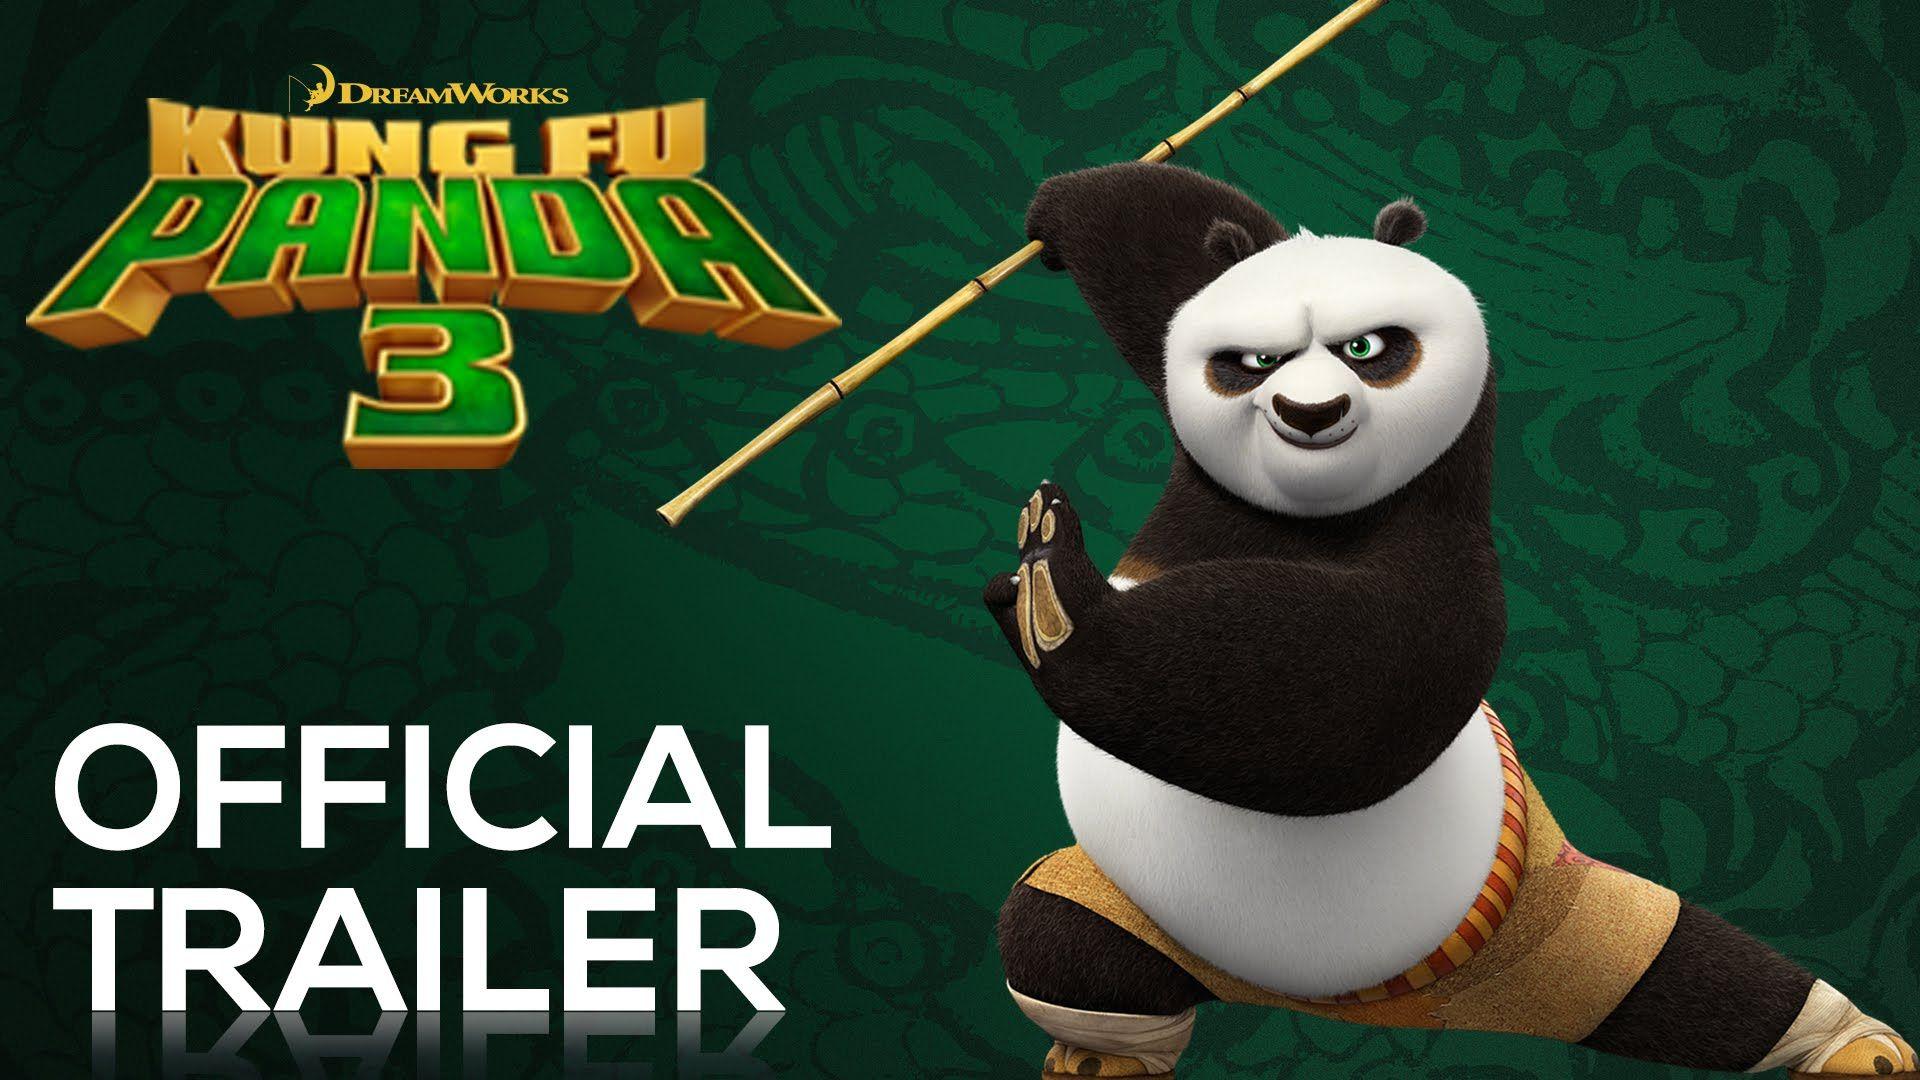 Kung Fu Panda 3 Trailer Kung Fu Panda Kung Fu Panda 3 Kung Fu